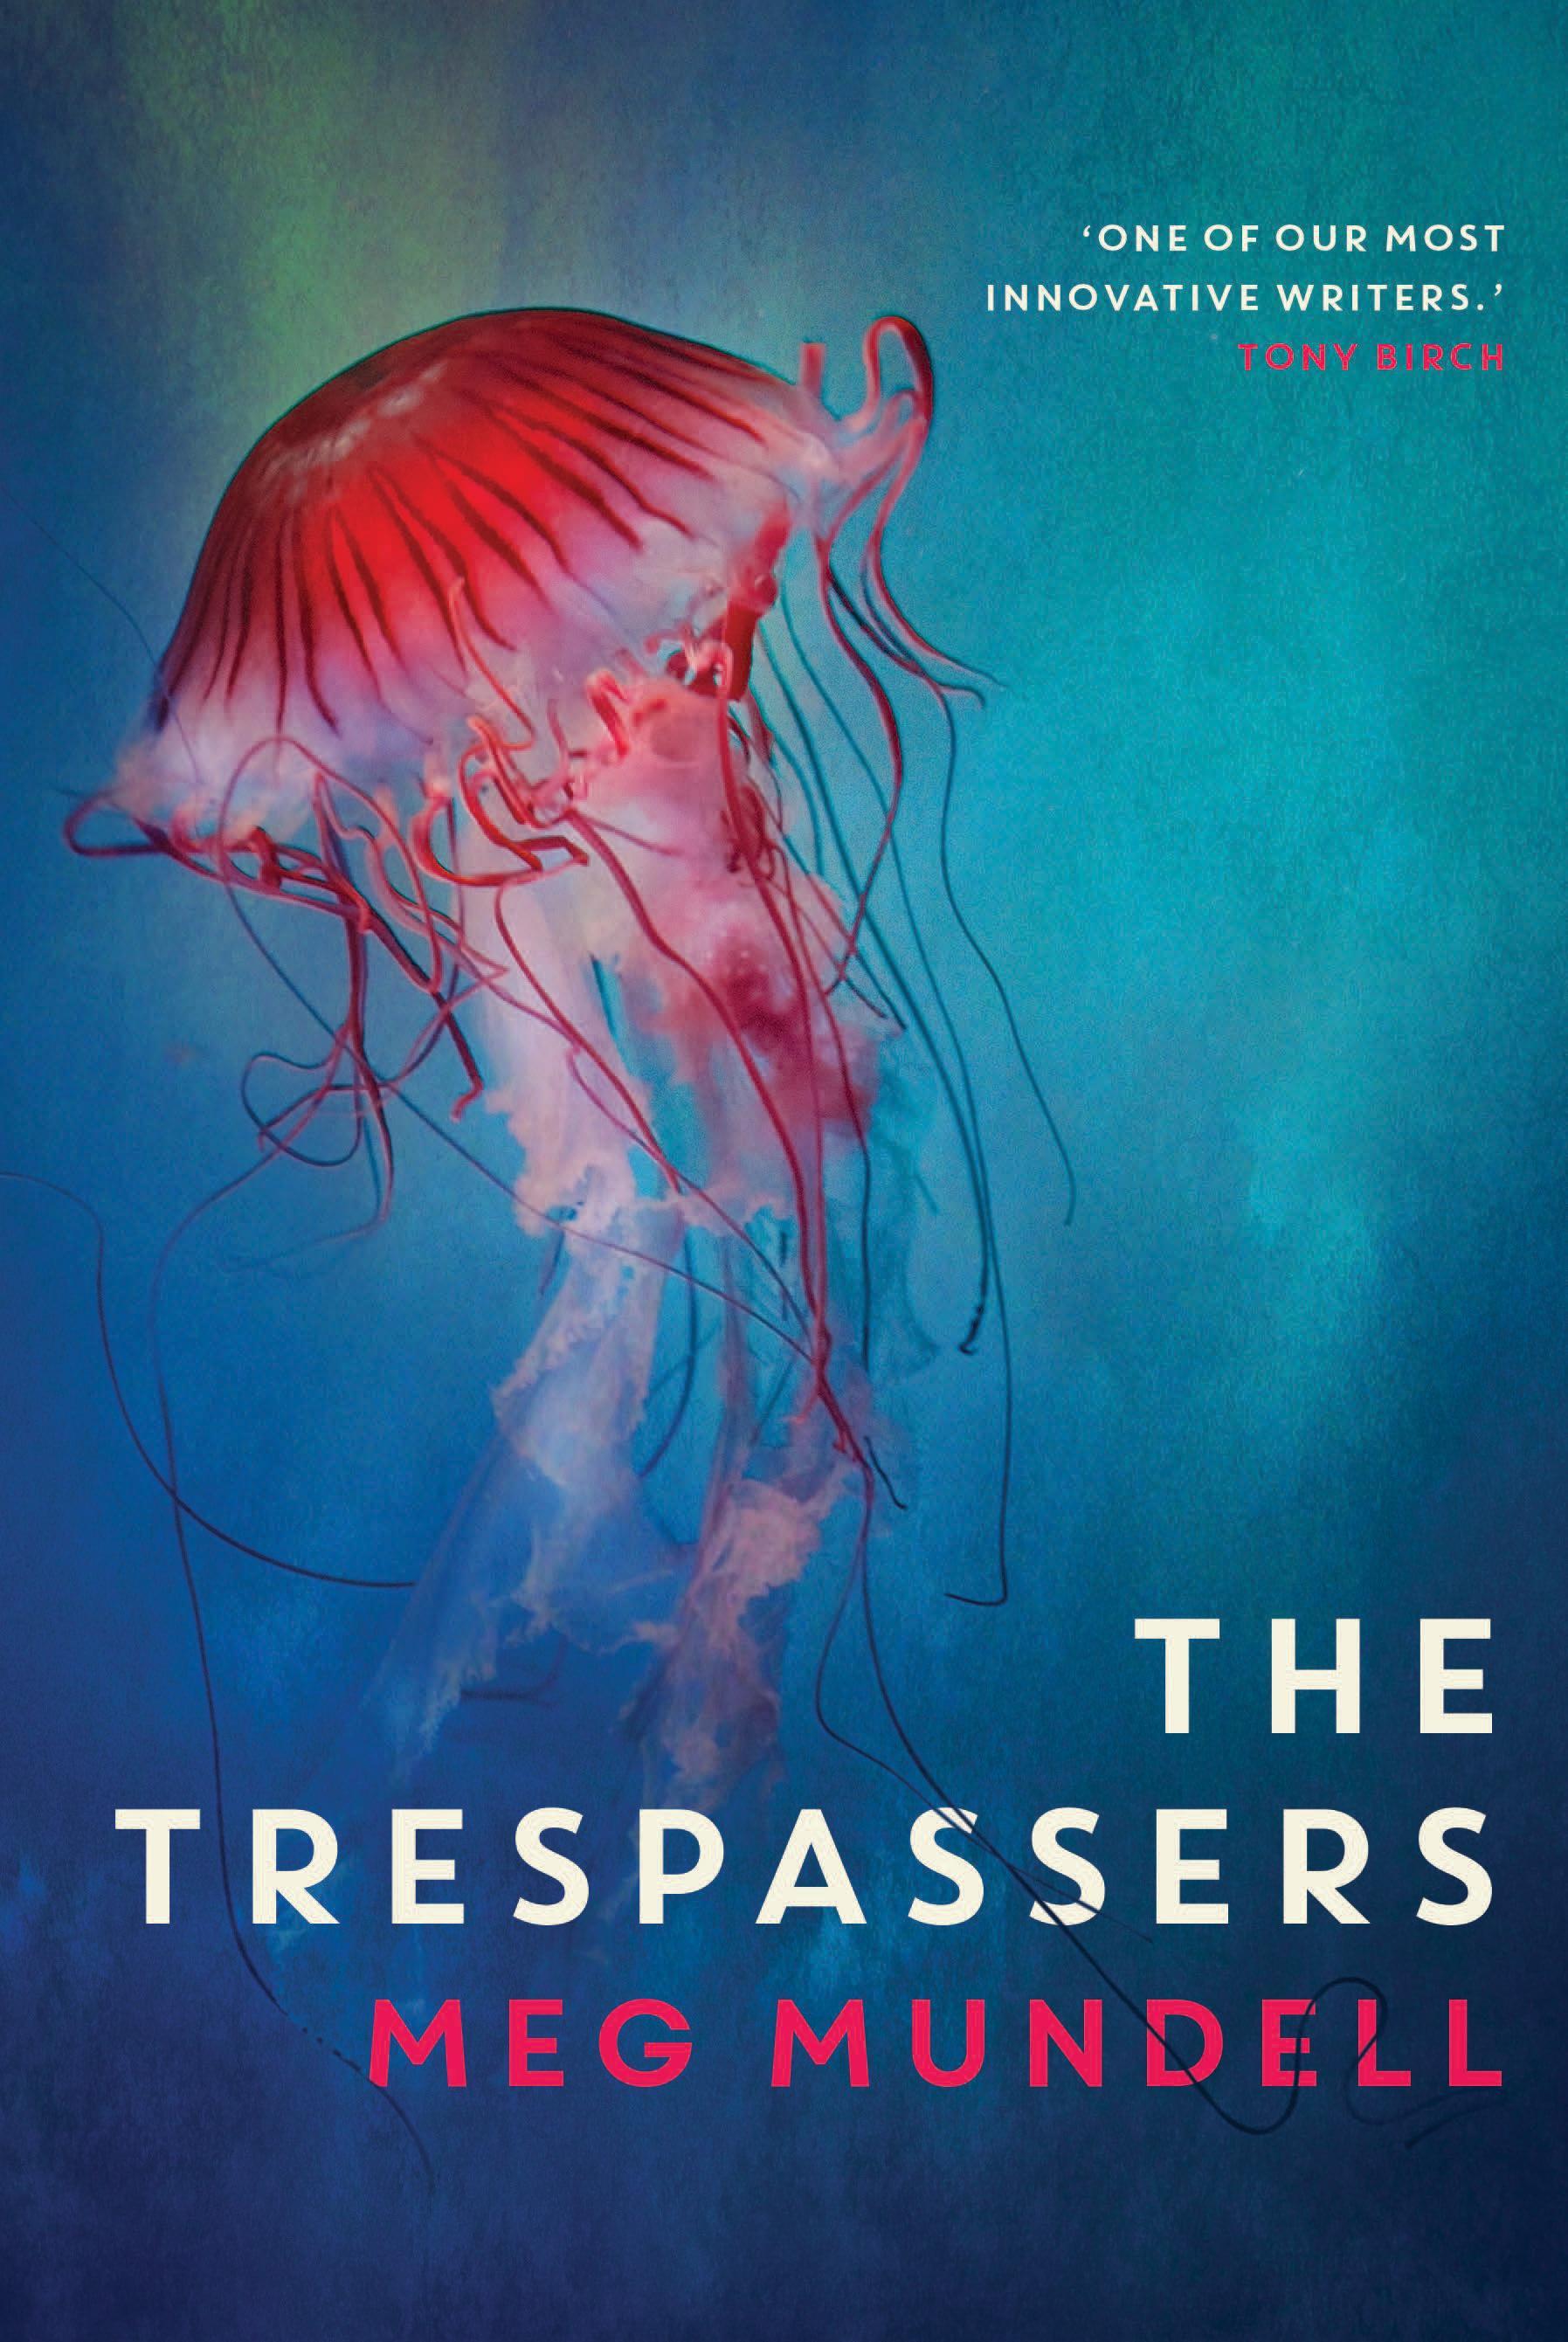 TheTrespassers